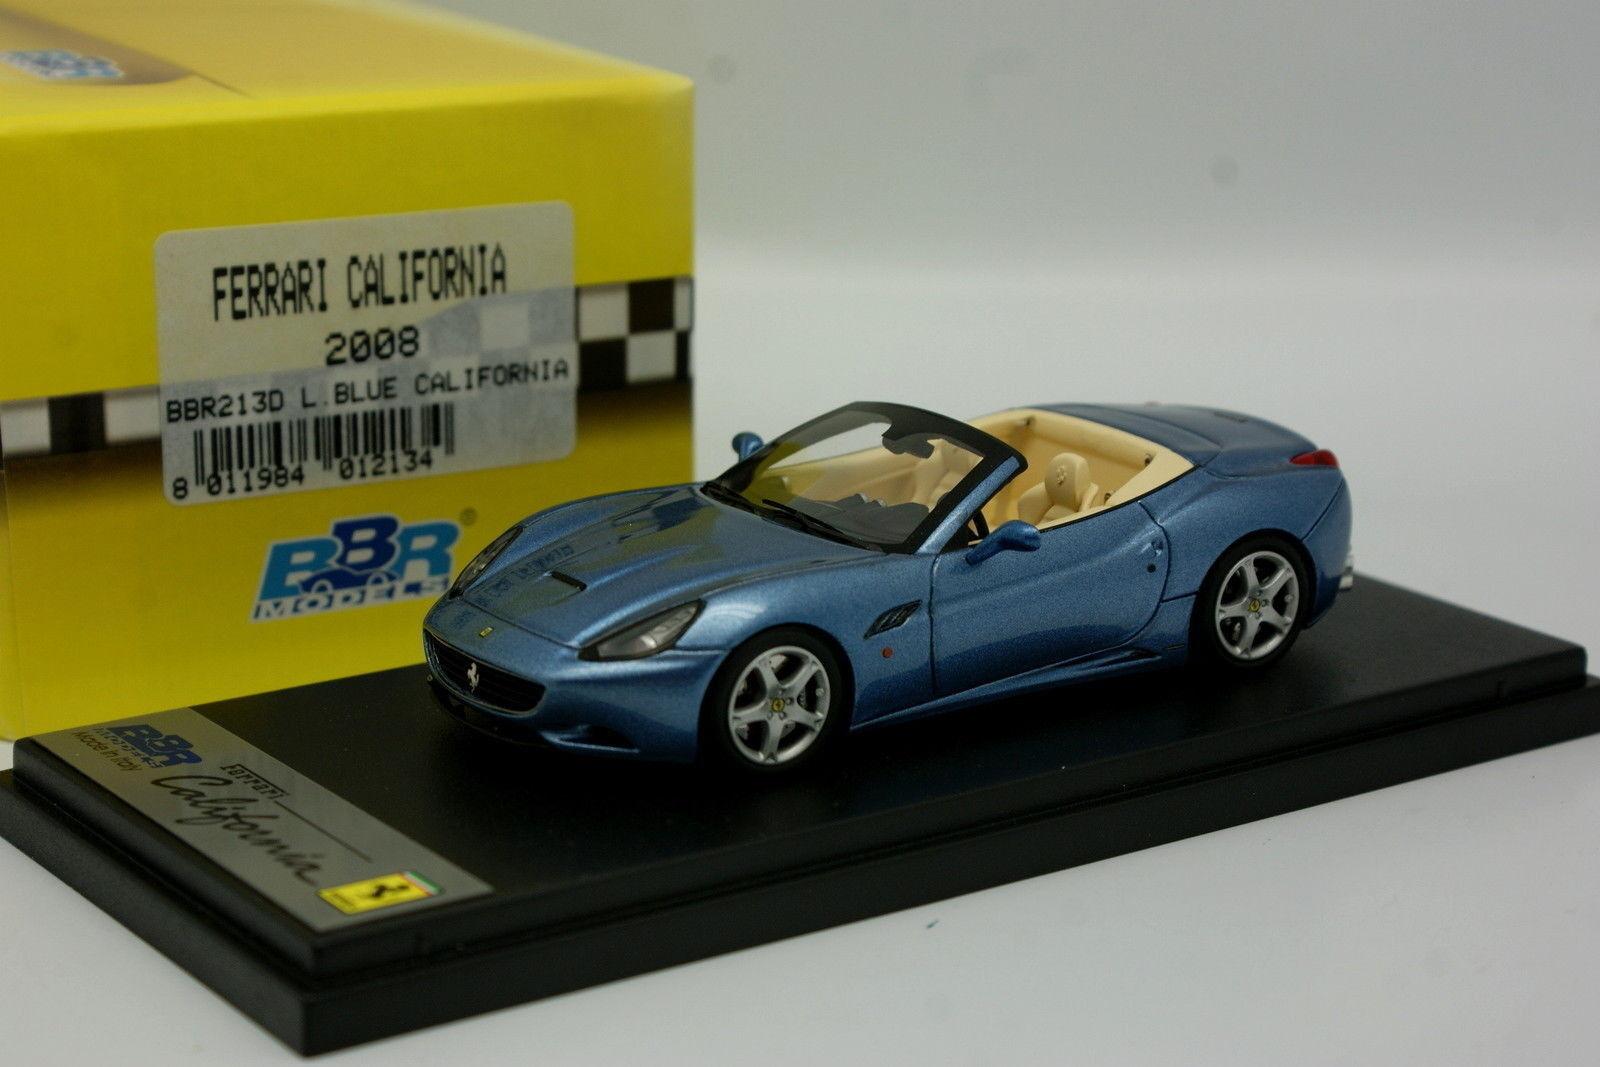 BBR 1 43 - Ferrari California 2008 bluee